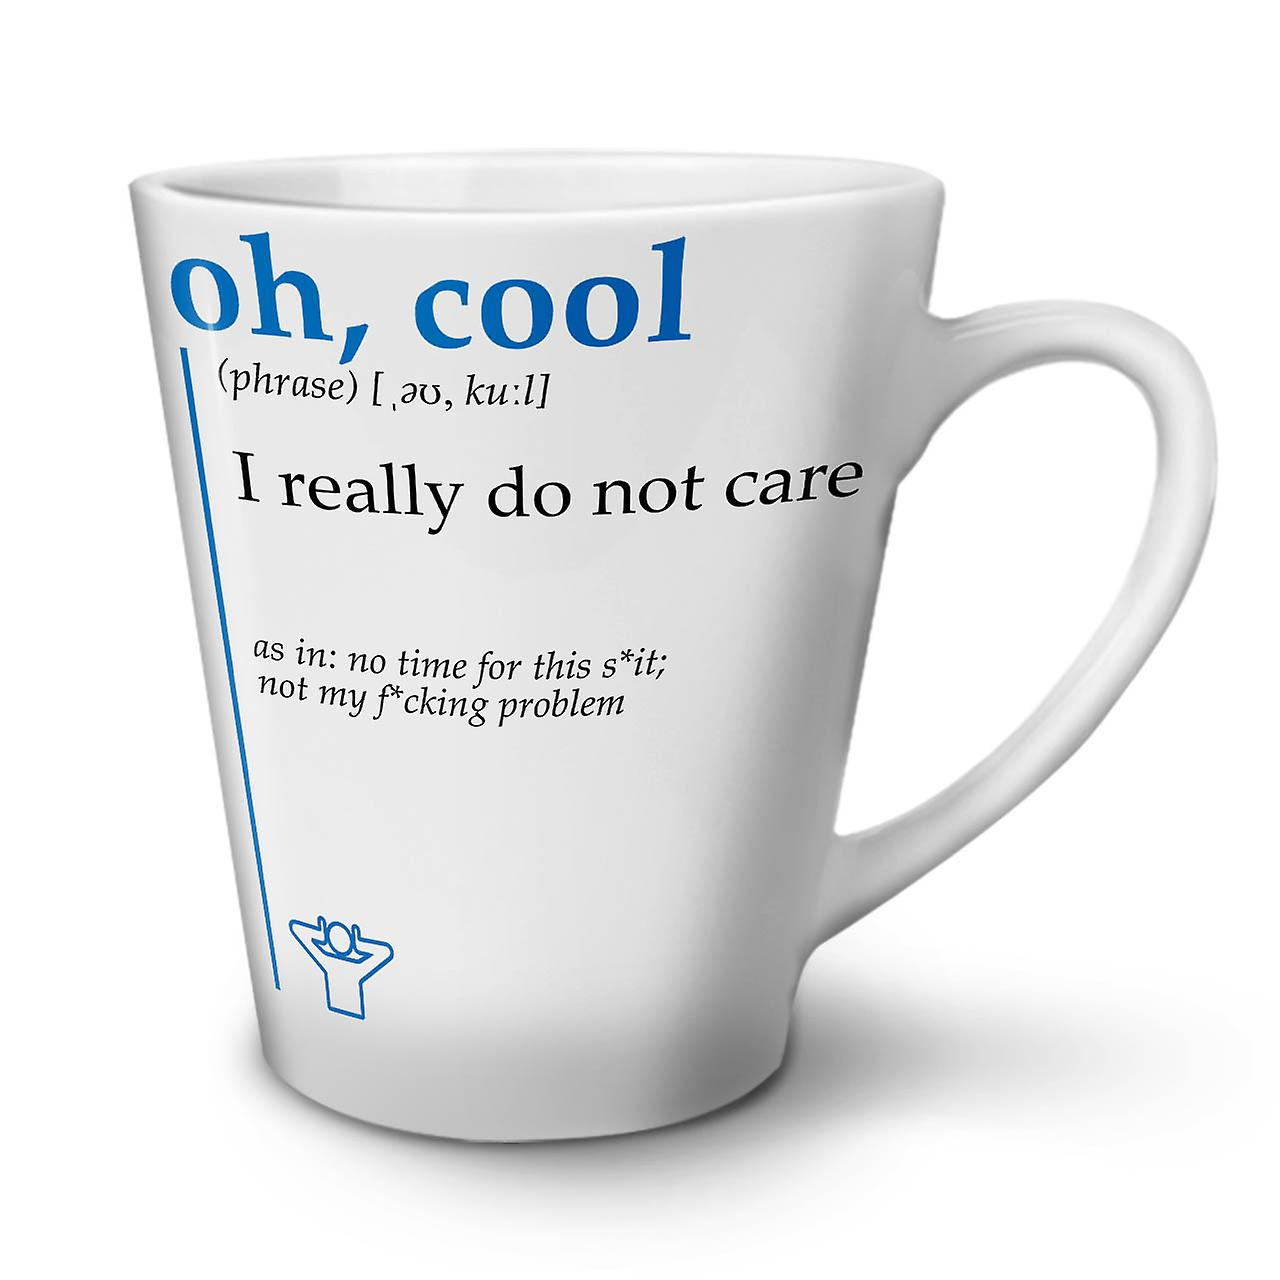 12 Café En Cool Nouvelle OzWellcoda Céramique Blanche Tasse Oh Latte XOZTwPiulk